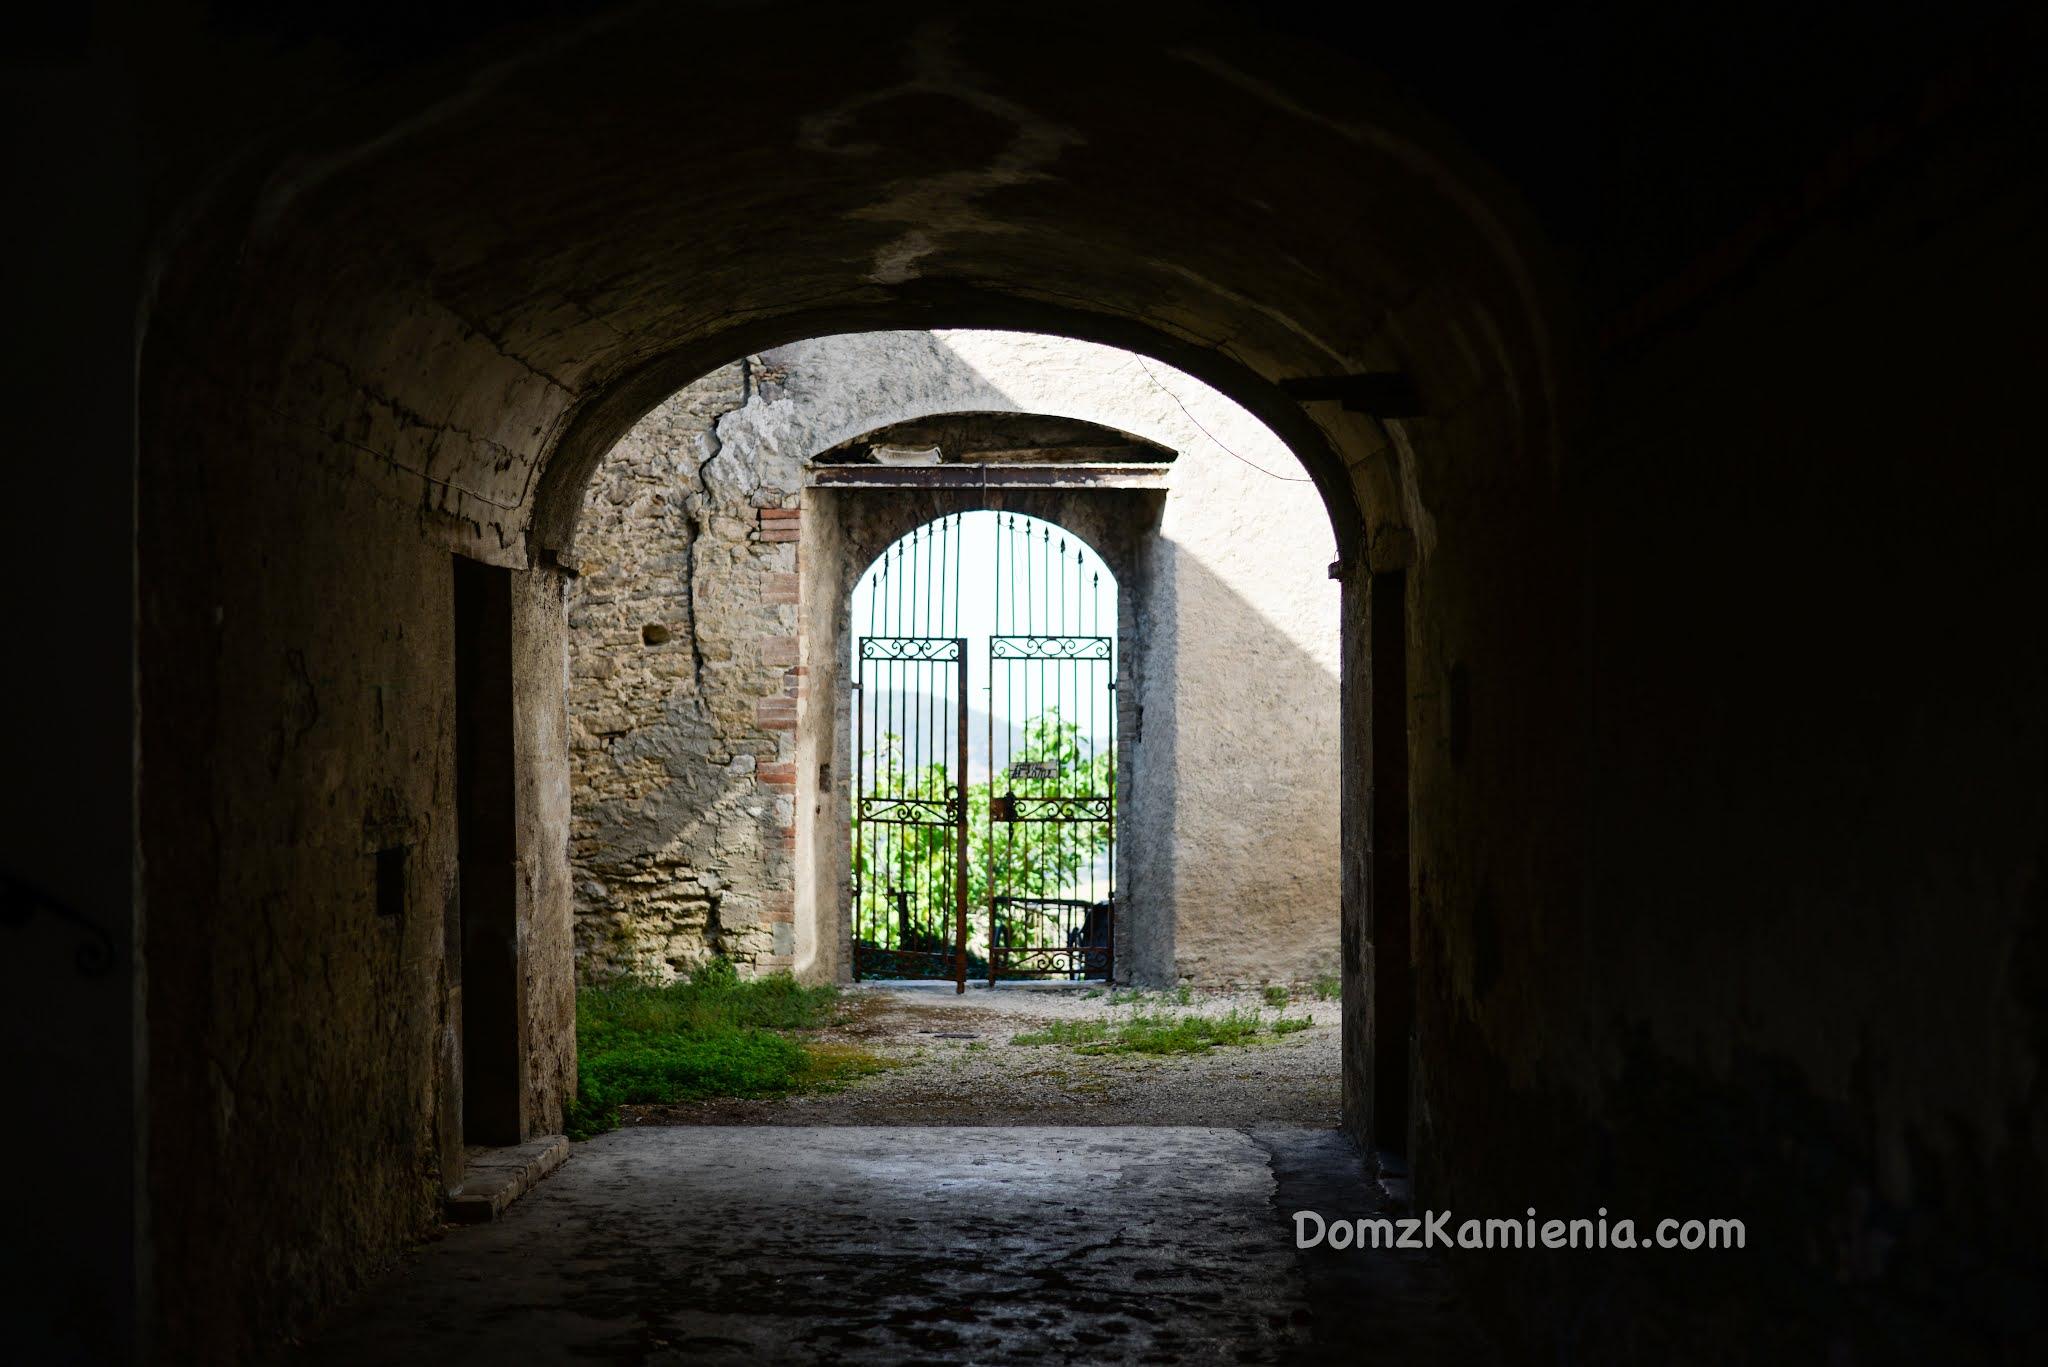 Maiella i Roccascalegna, Dom z Kamienia blog